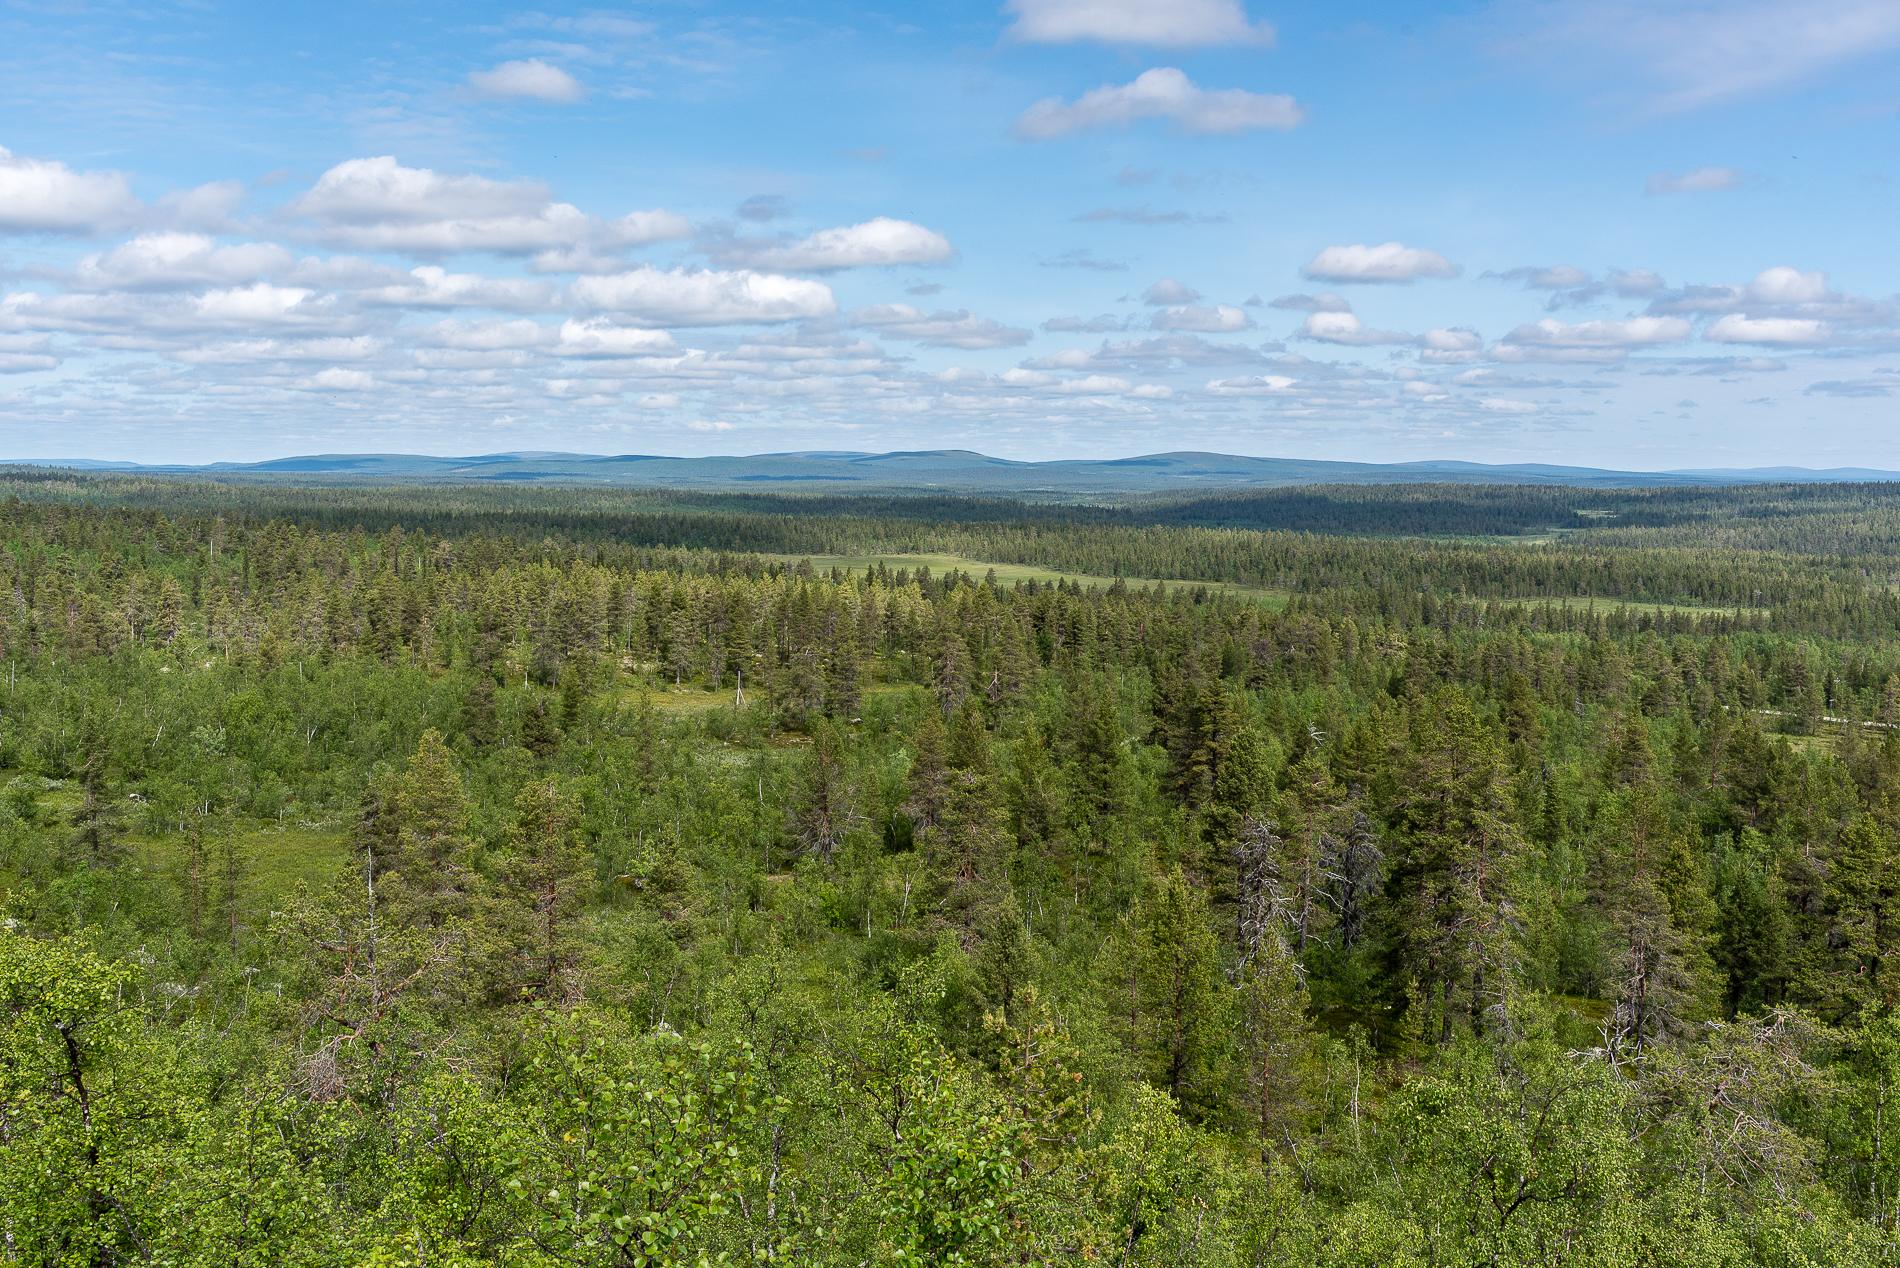 Finland, Trees